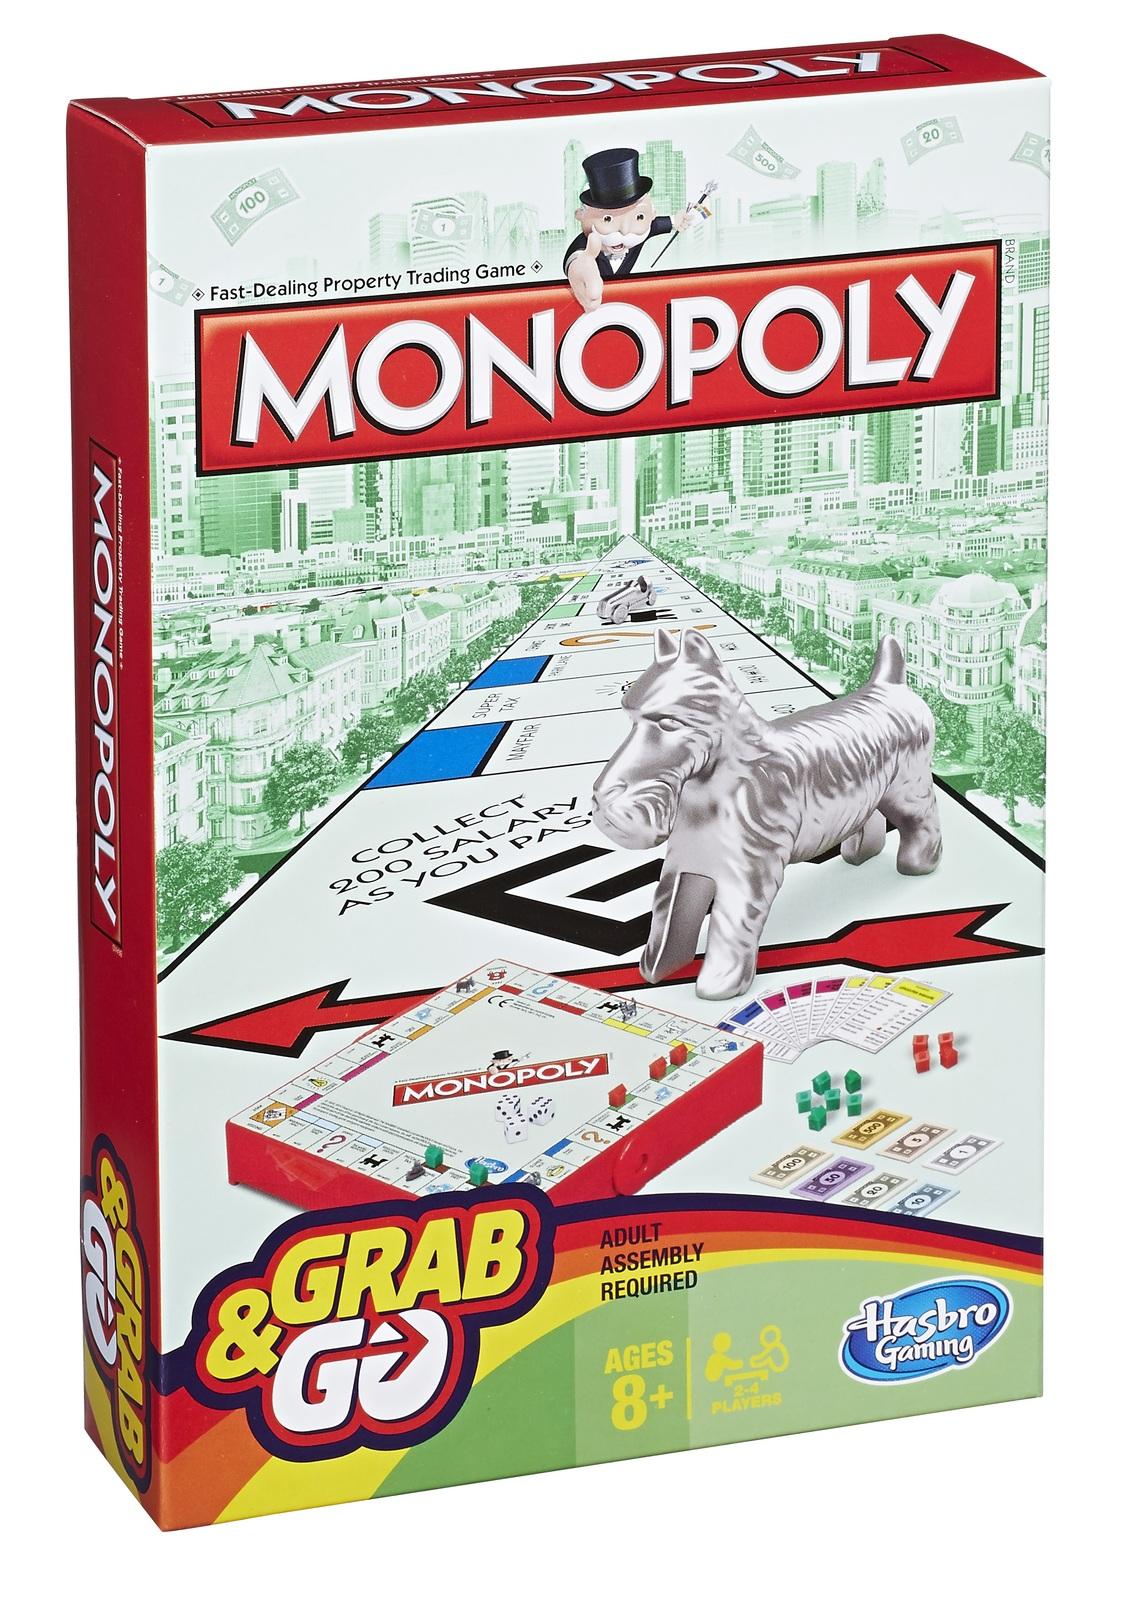 Monopoly - Grab & Go Edition image